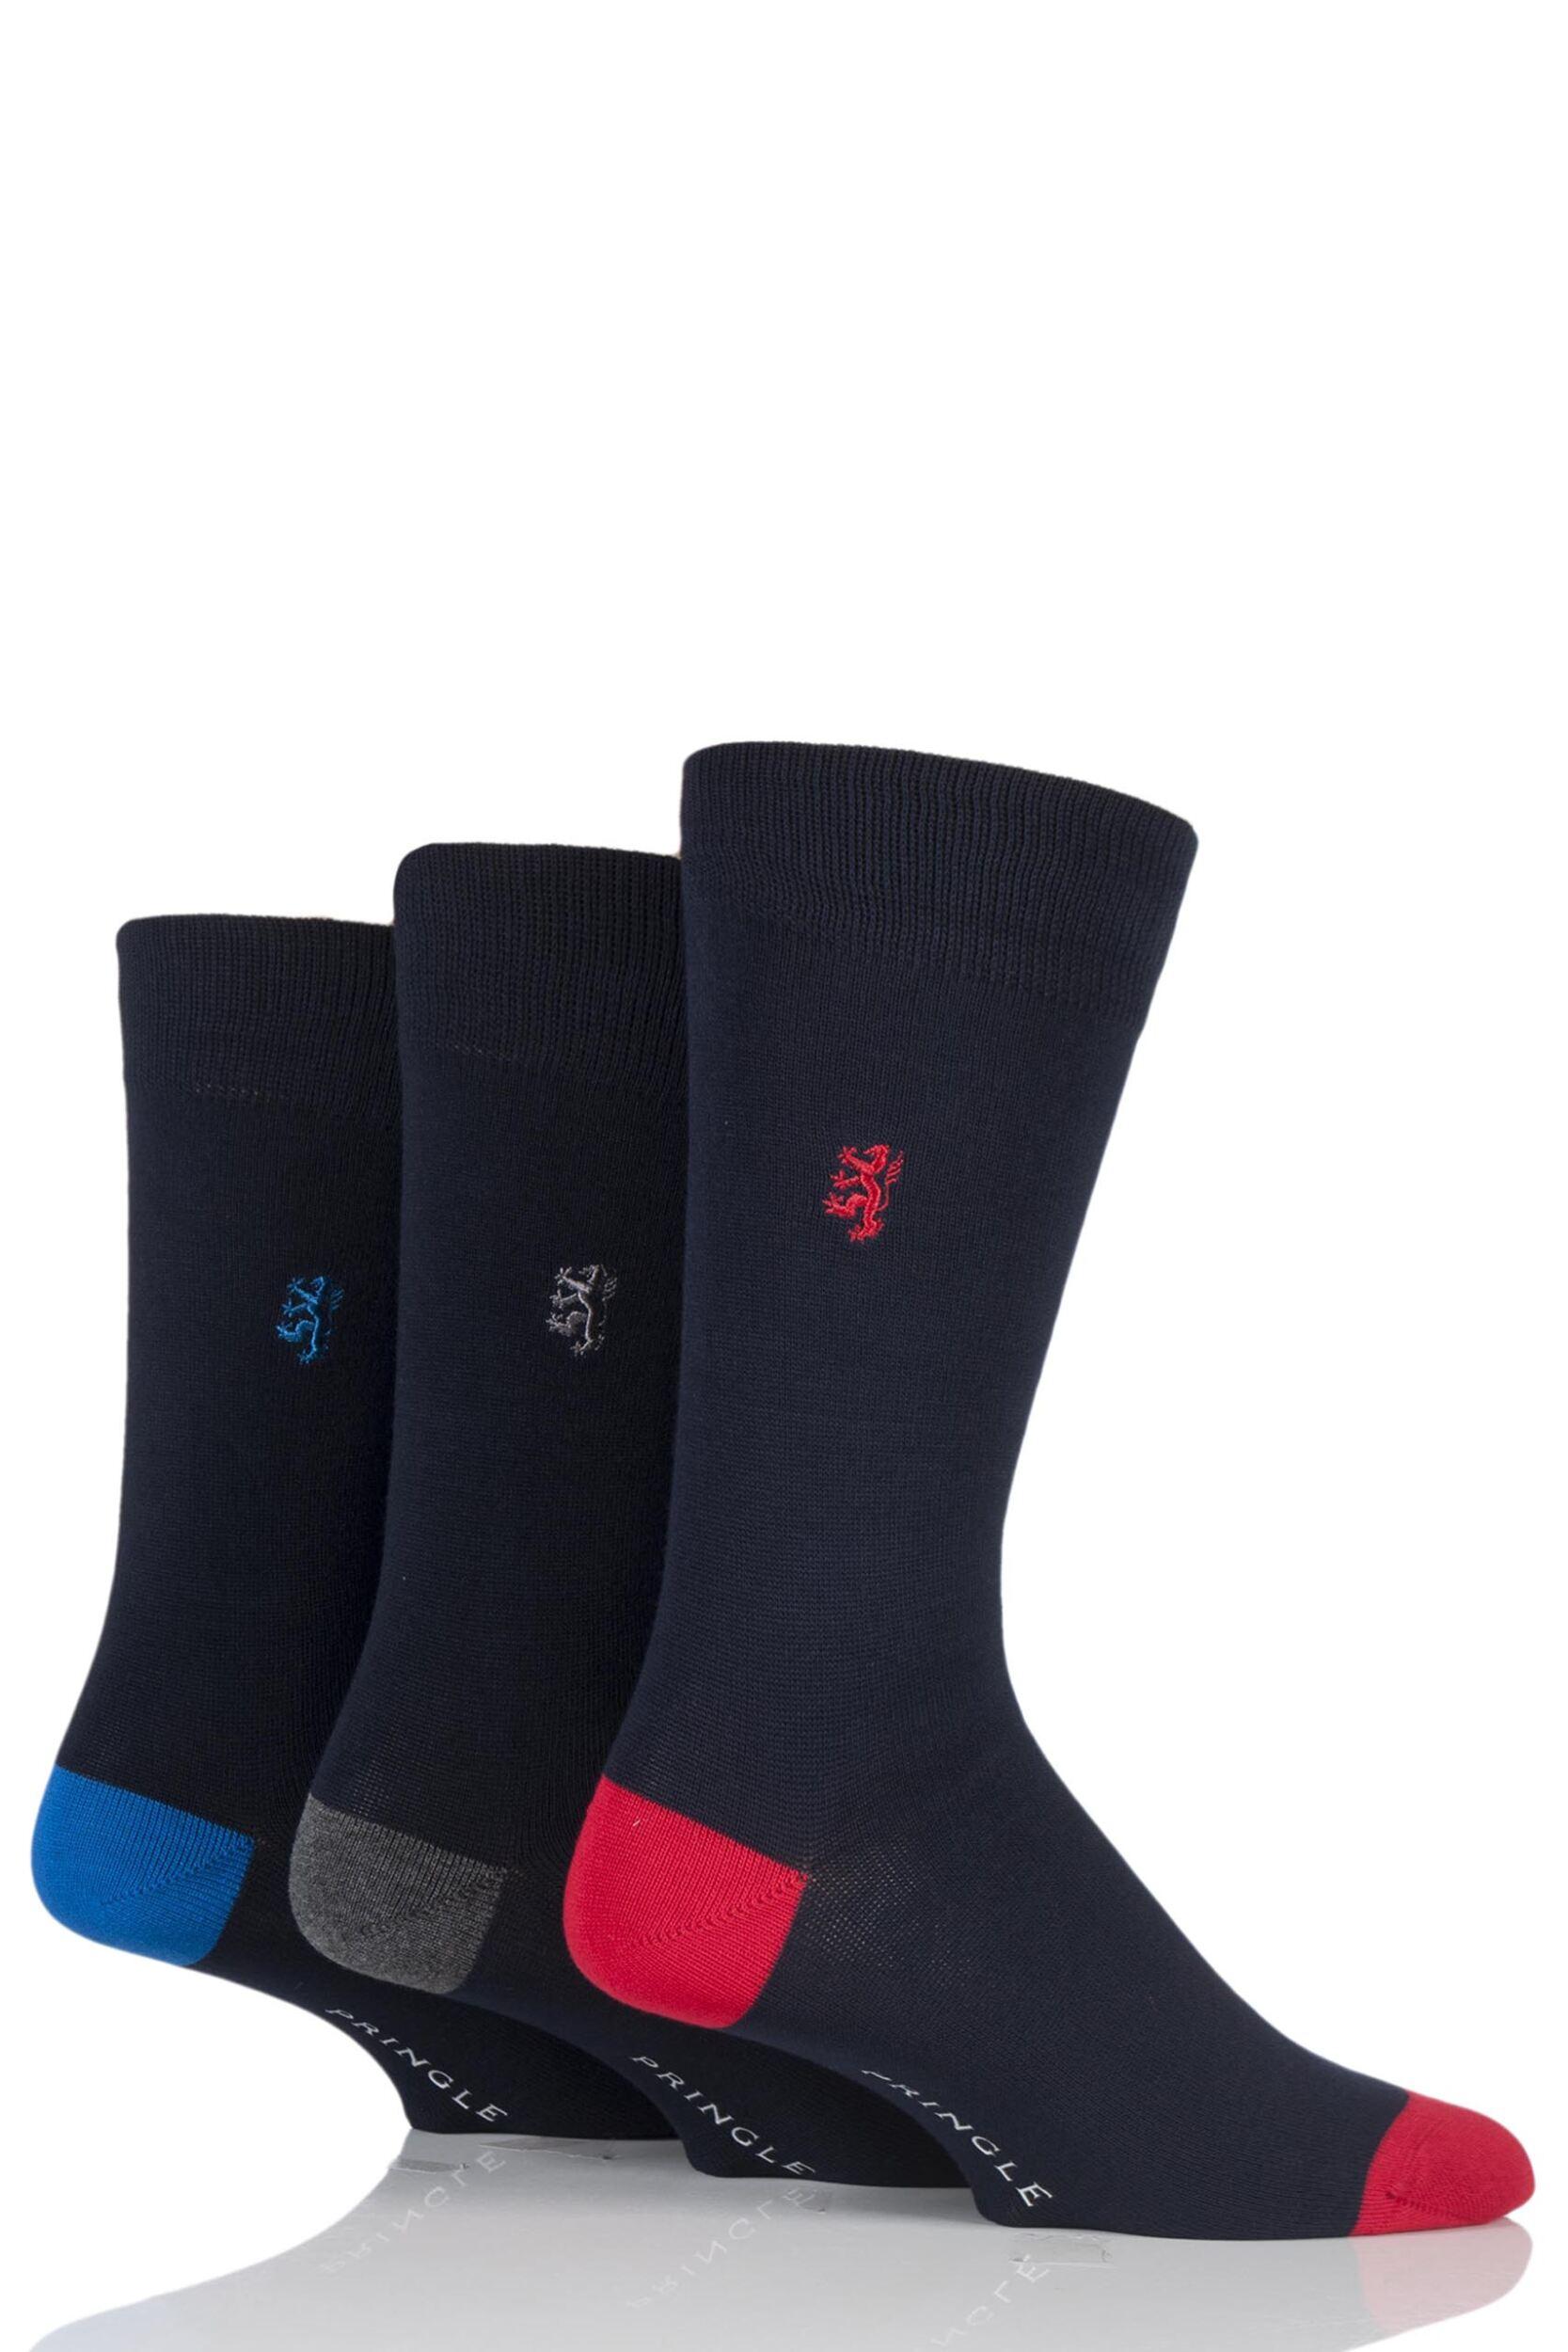 Mens-3-Pair-Pringle-of-Scotland-Classic-Bamboo-Plain-Socks